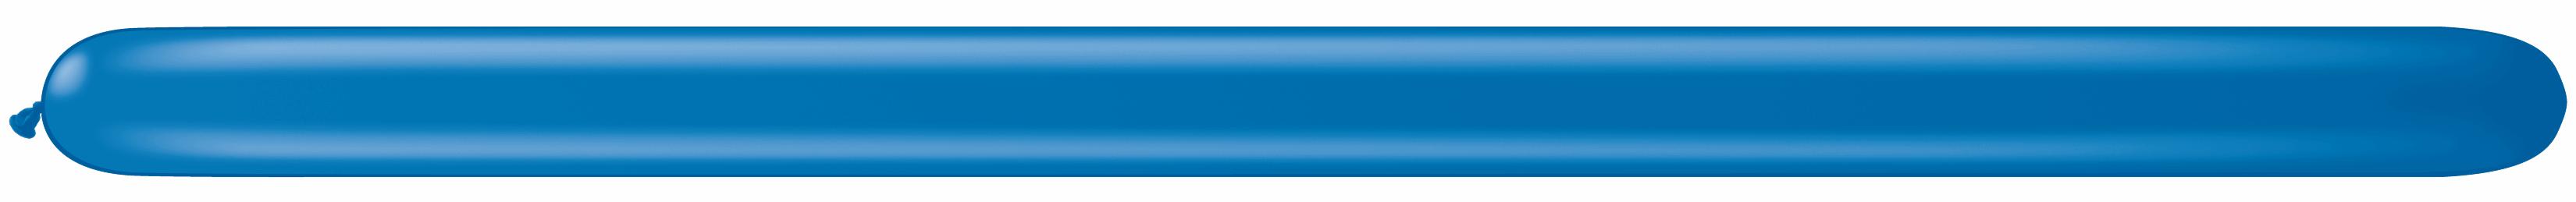 646Q Latex Balloons Entertainer (50 Count) Dark Blue